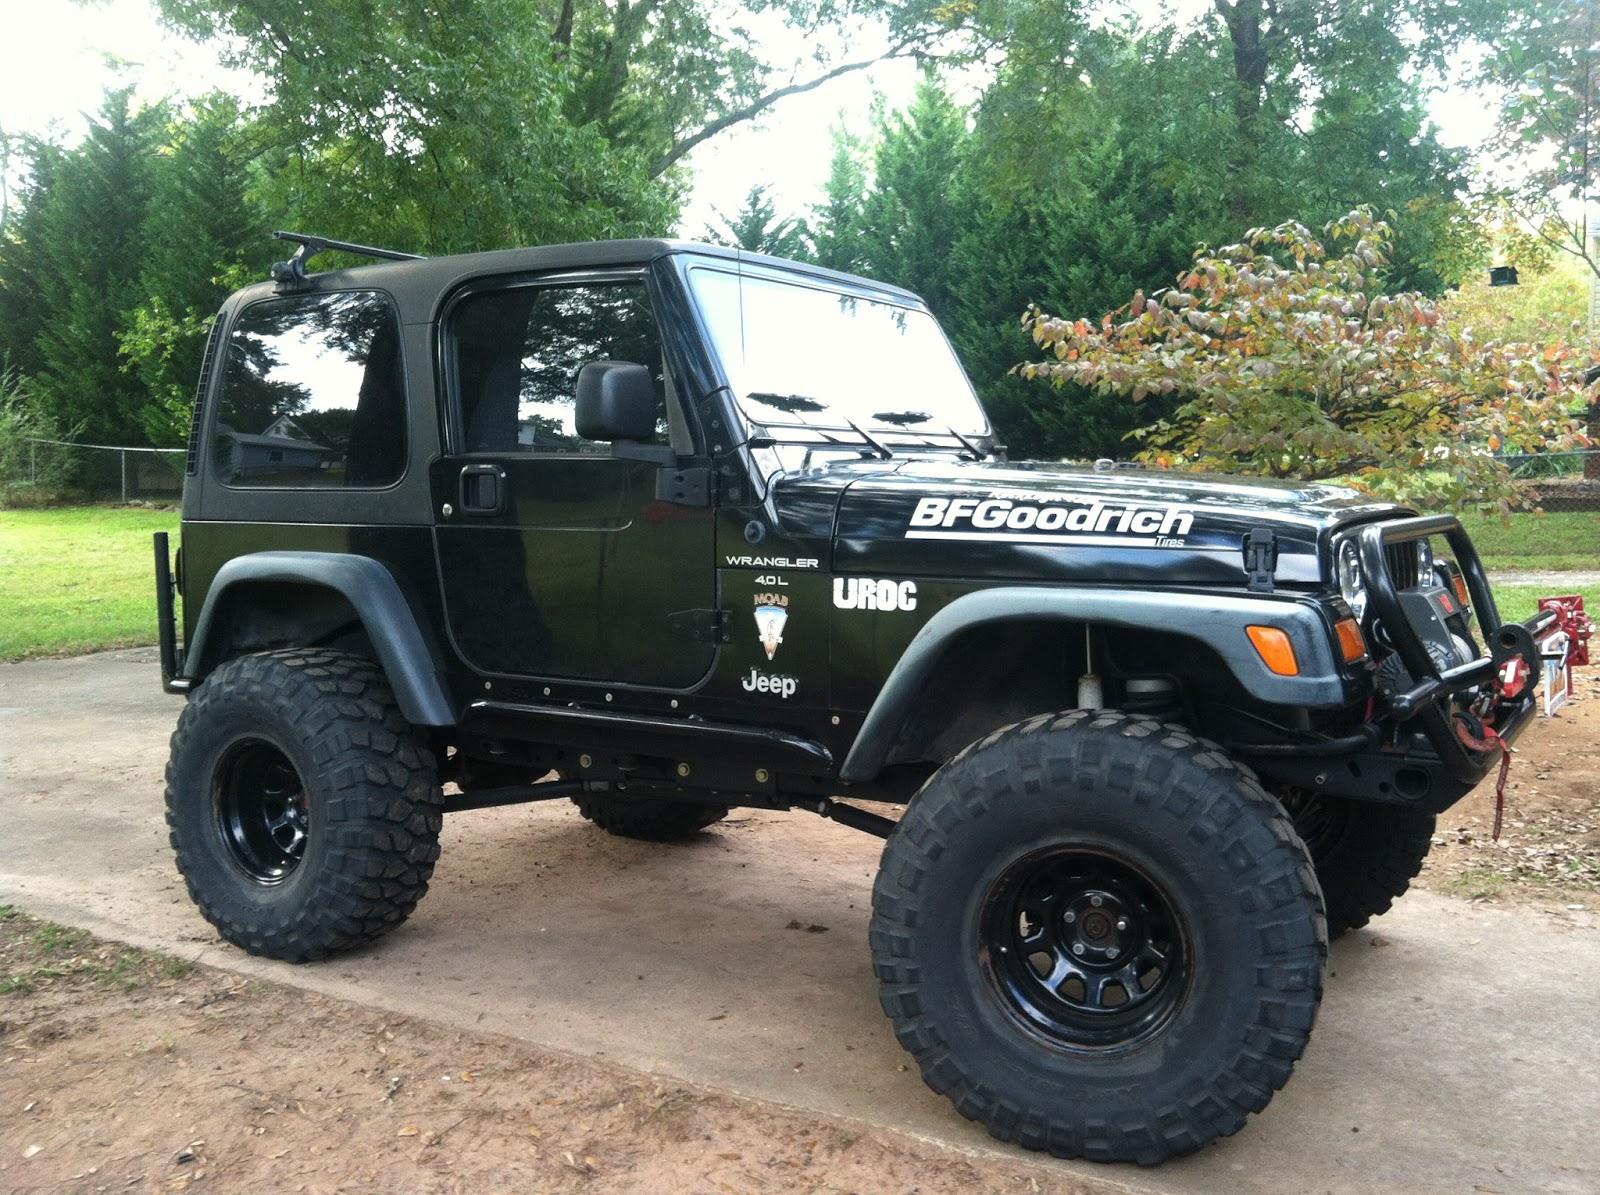 Jd s blacksheep 1997 jeep wrangler